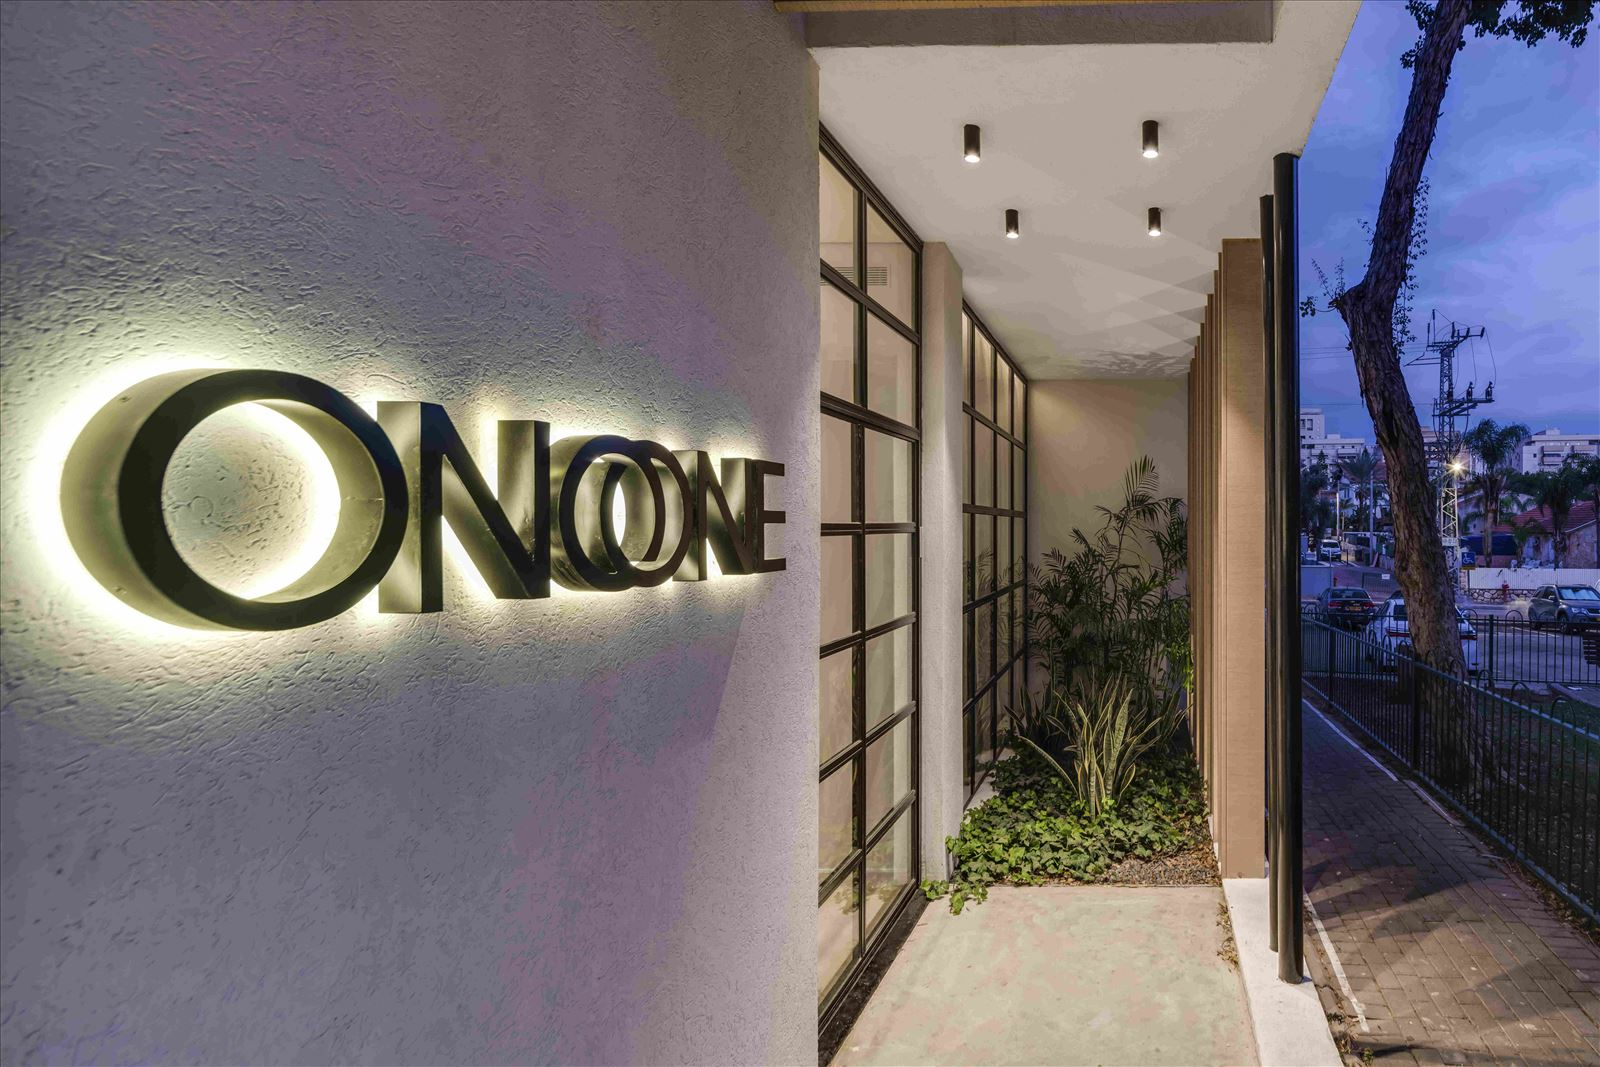 sales office - onone פרויקט תאורה במשרד מכירות